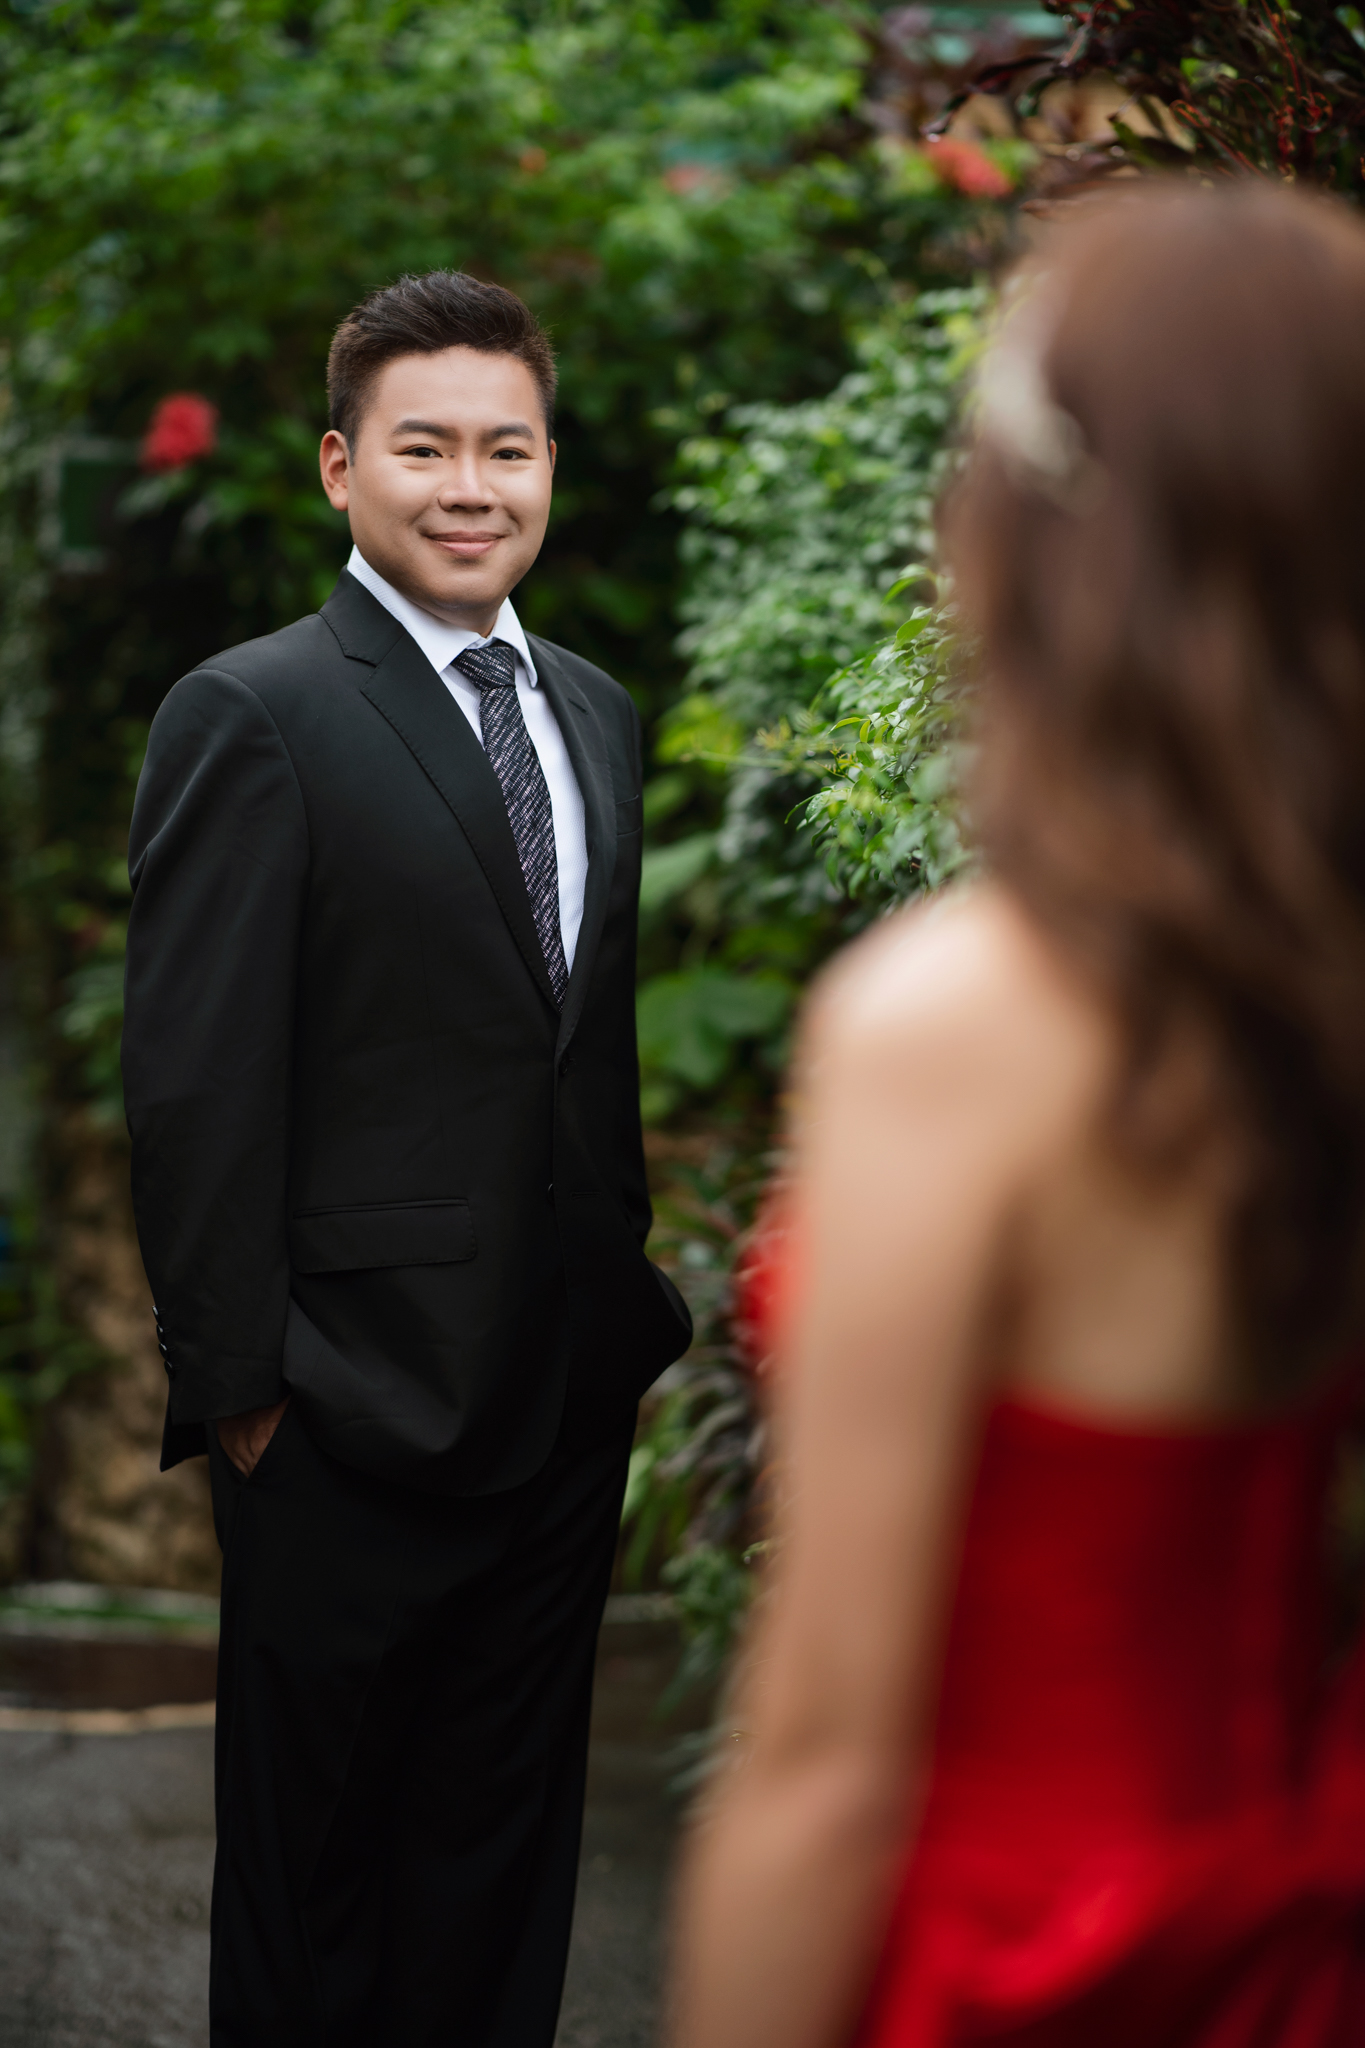 沖繩婚紗, 海外婚紗, Donfer, EW, EASTERN WEDDING